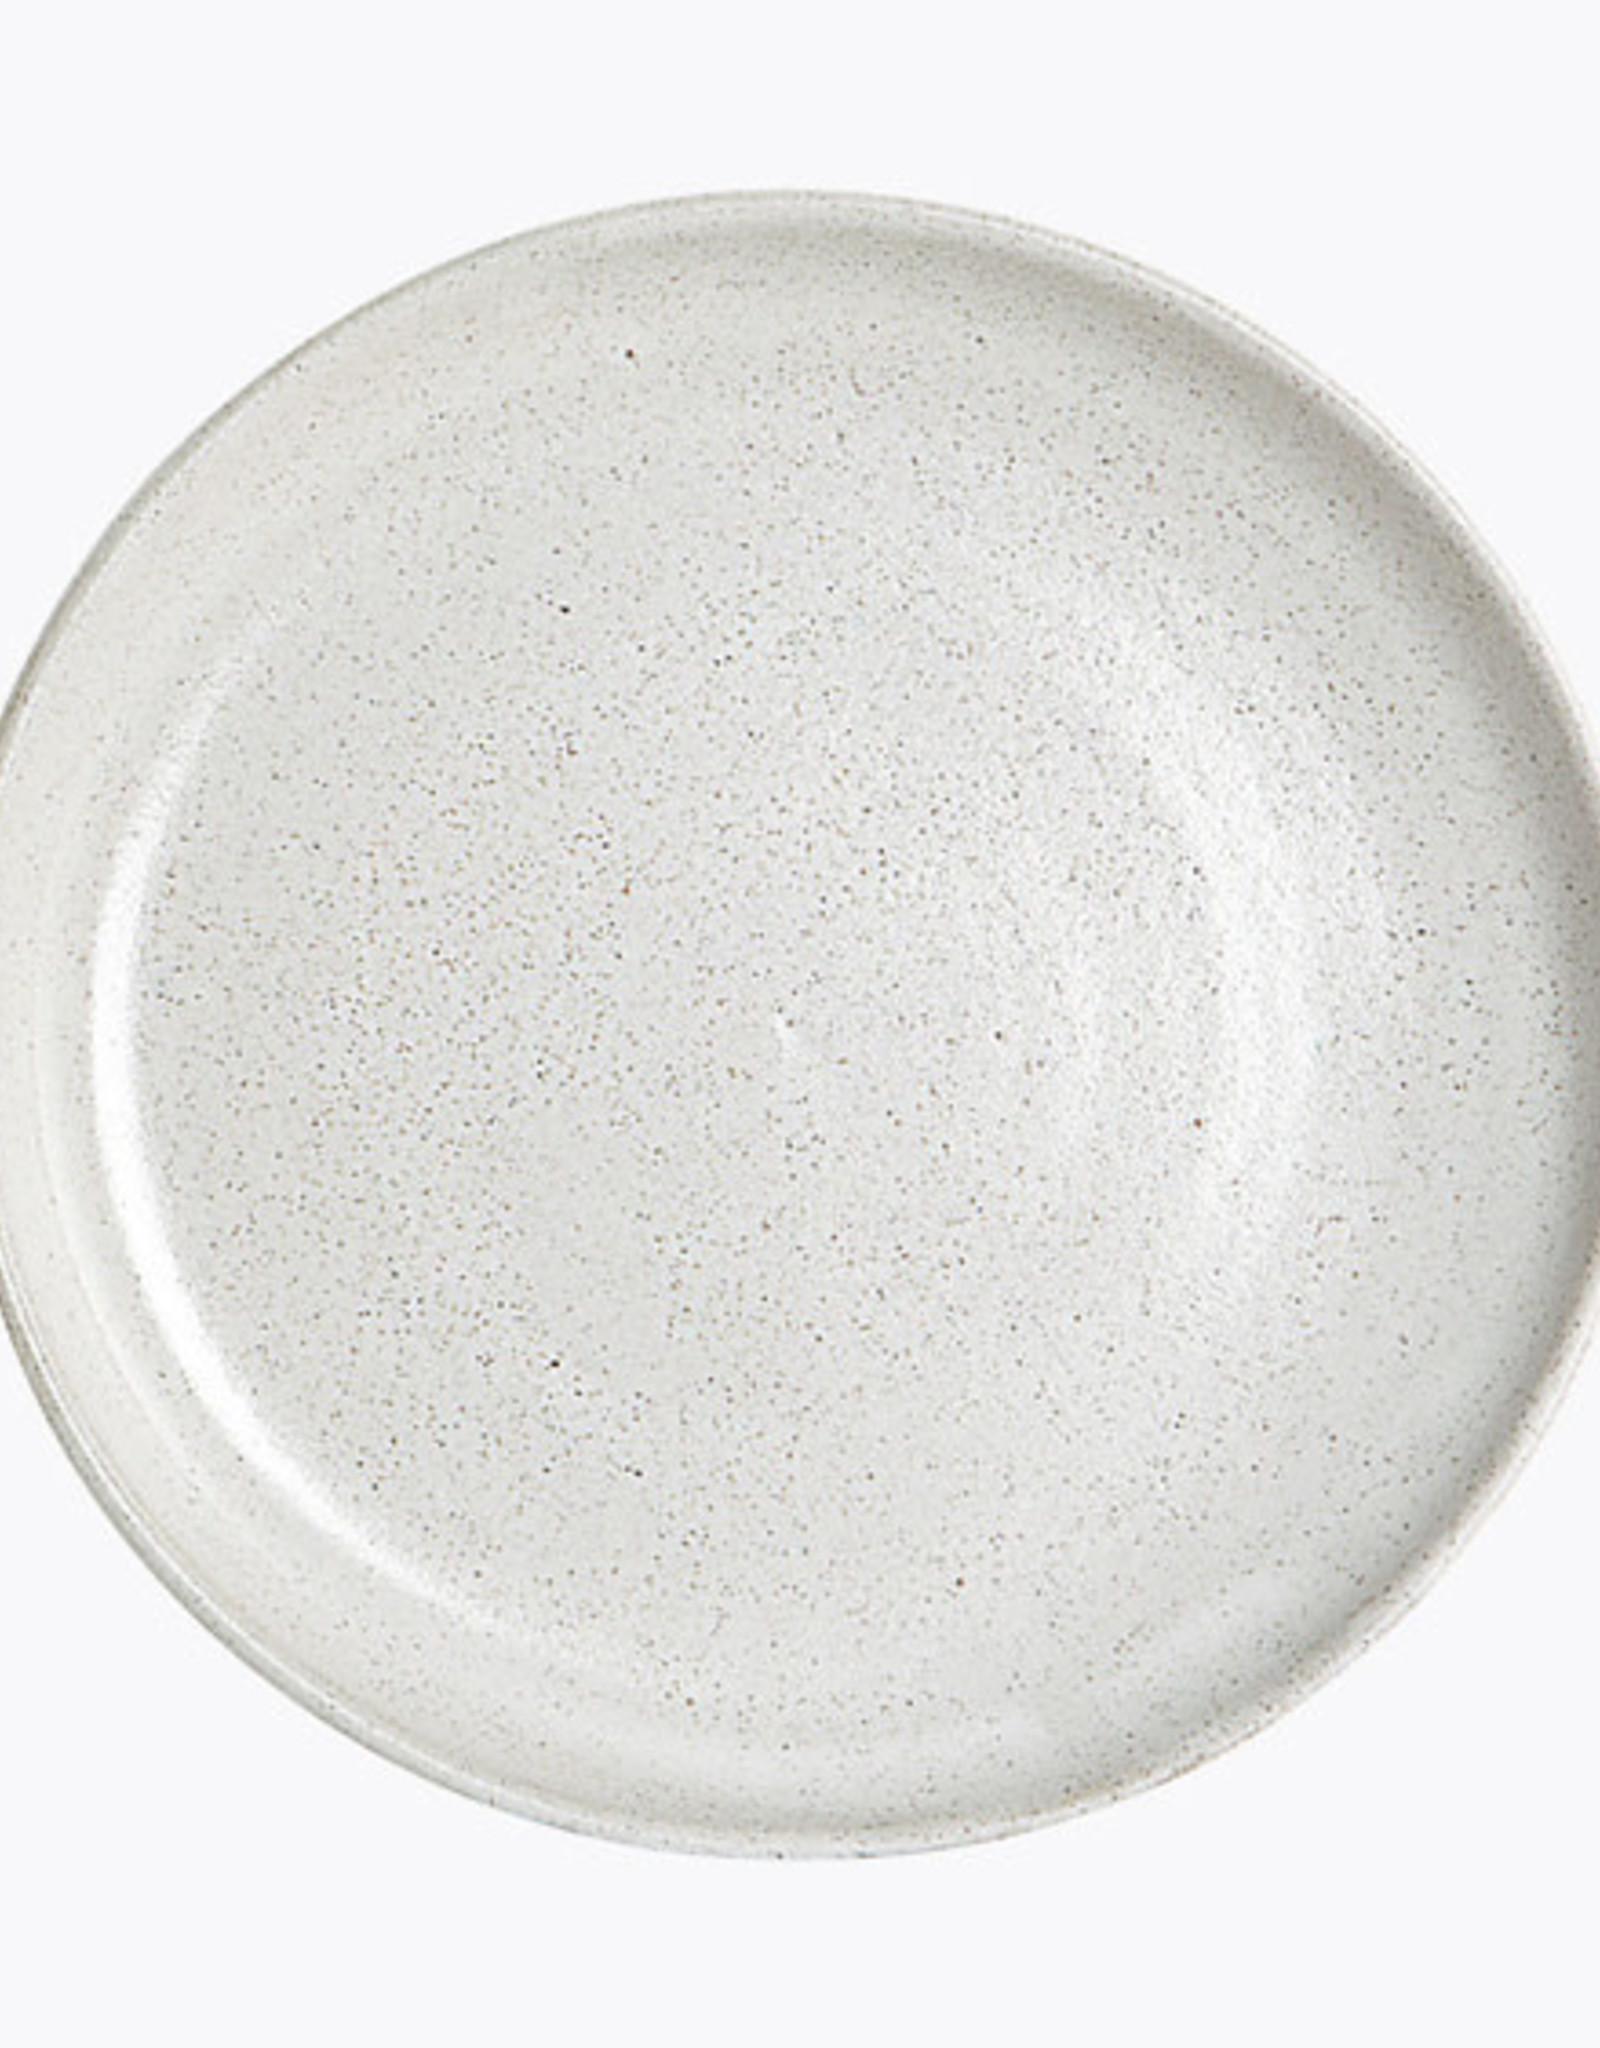 Ceramic Plate - White